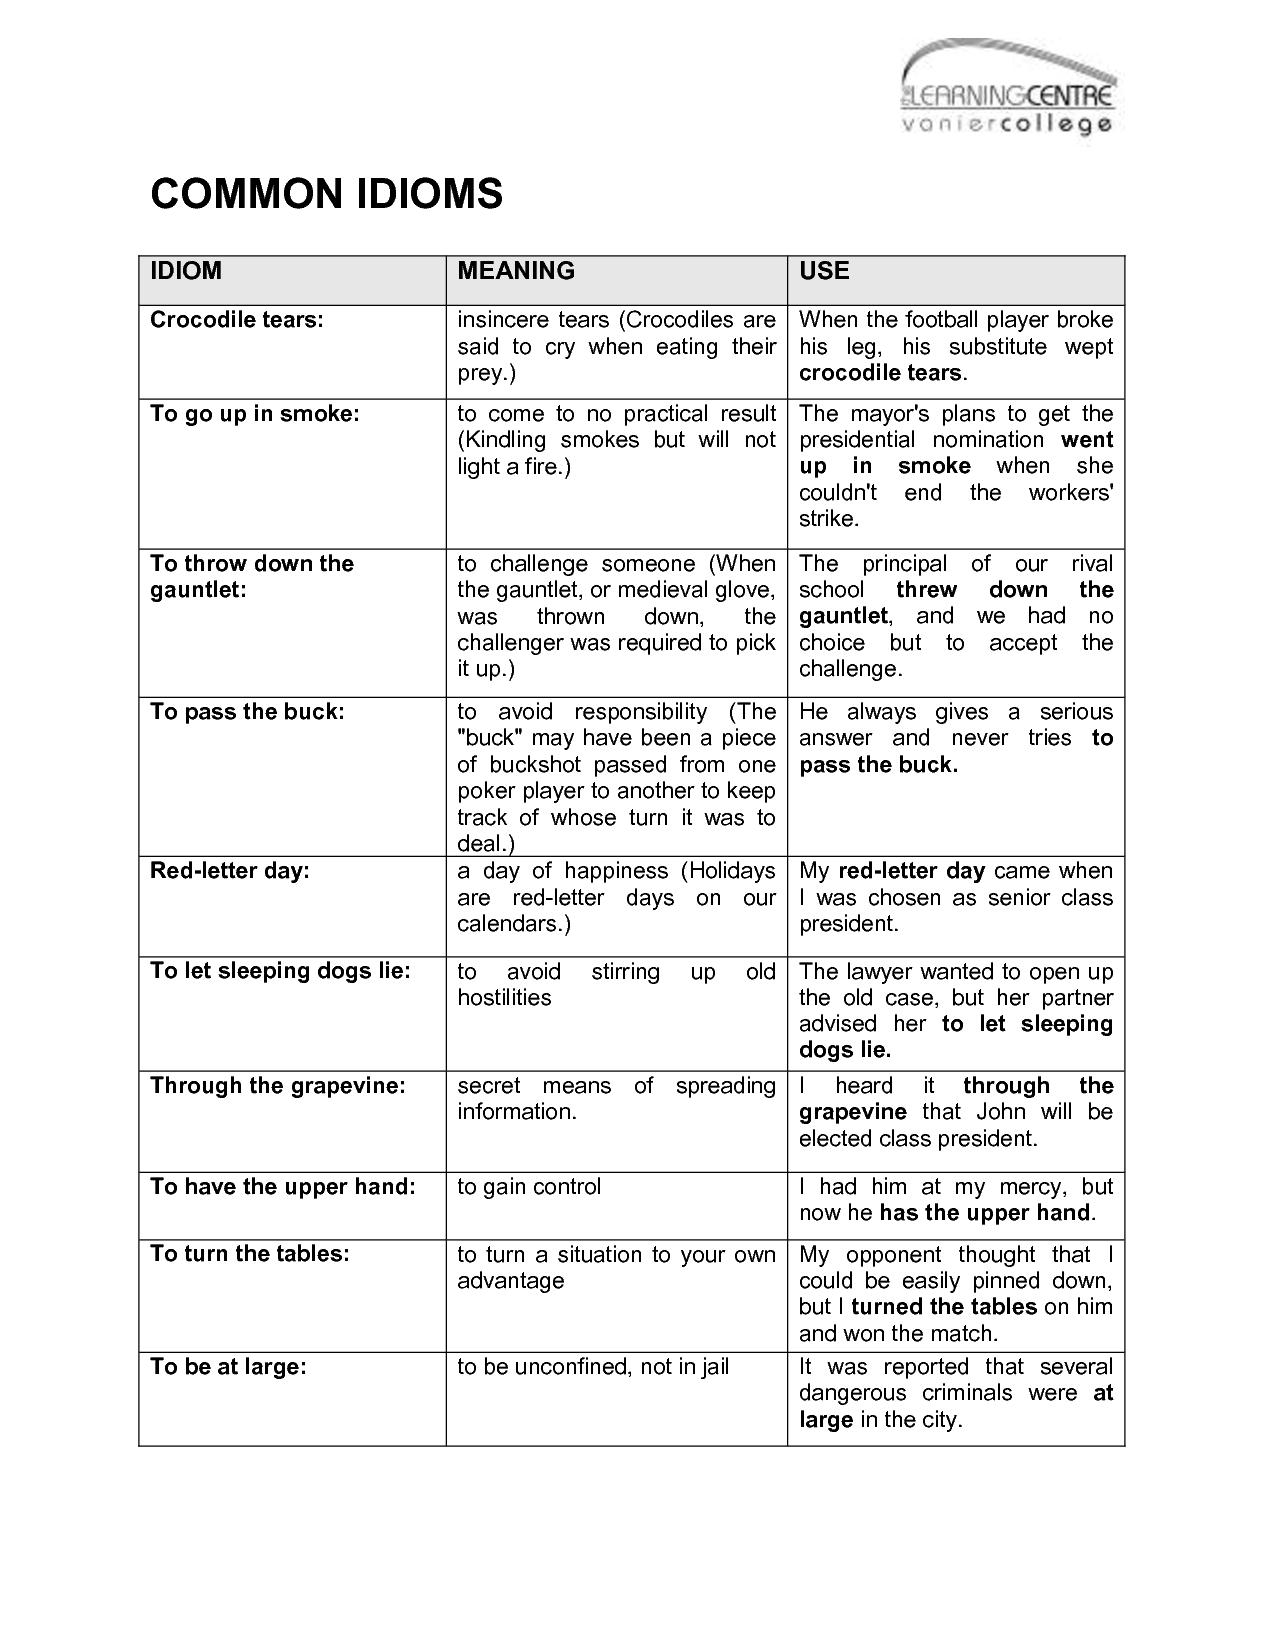 List Of Common Idioms